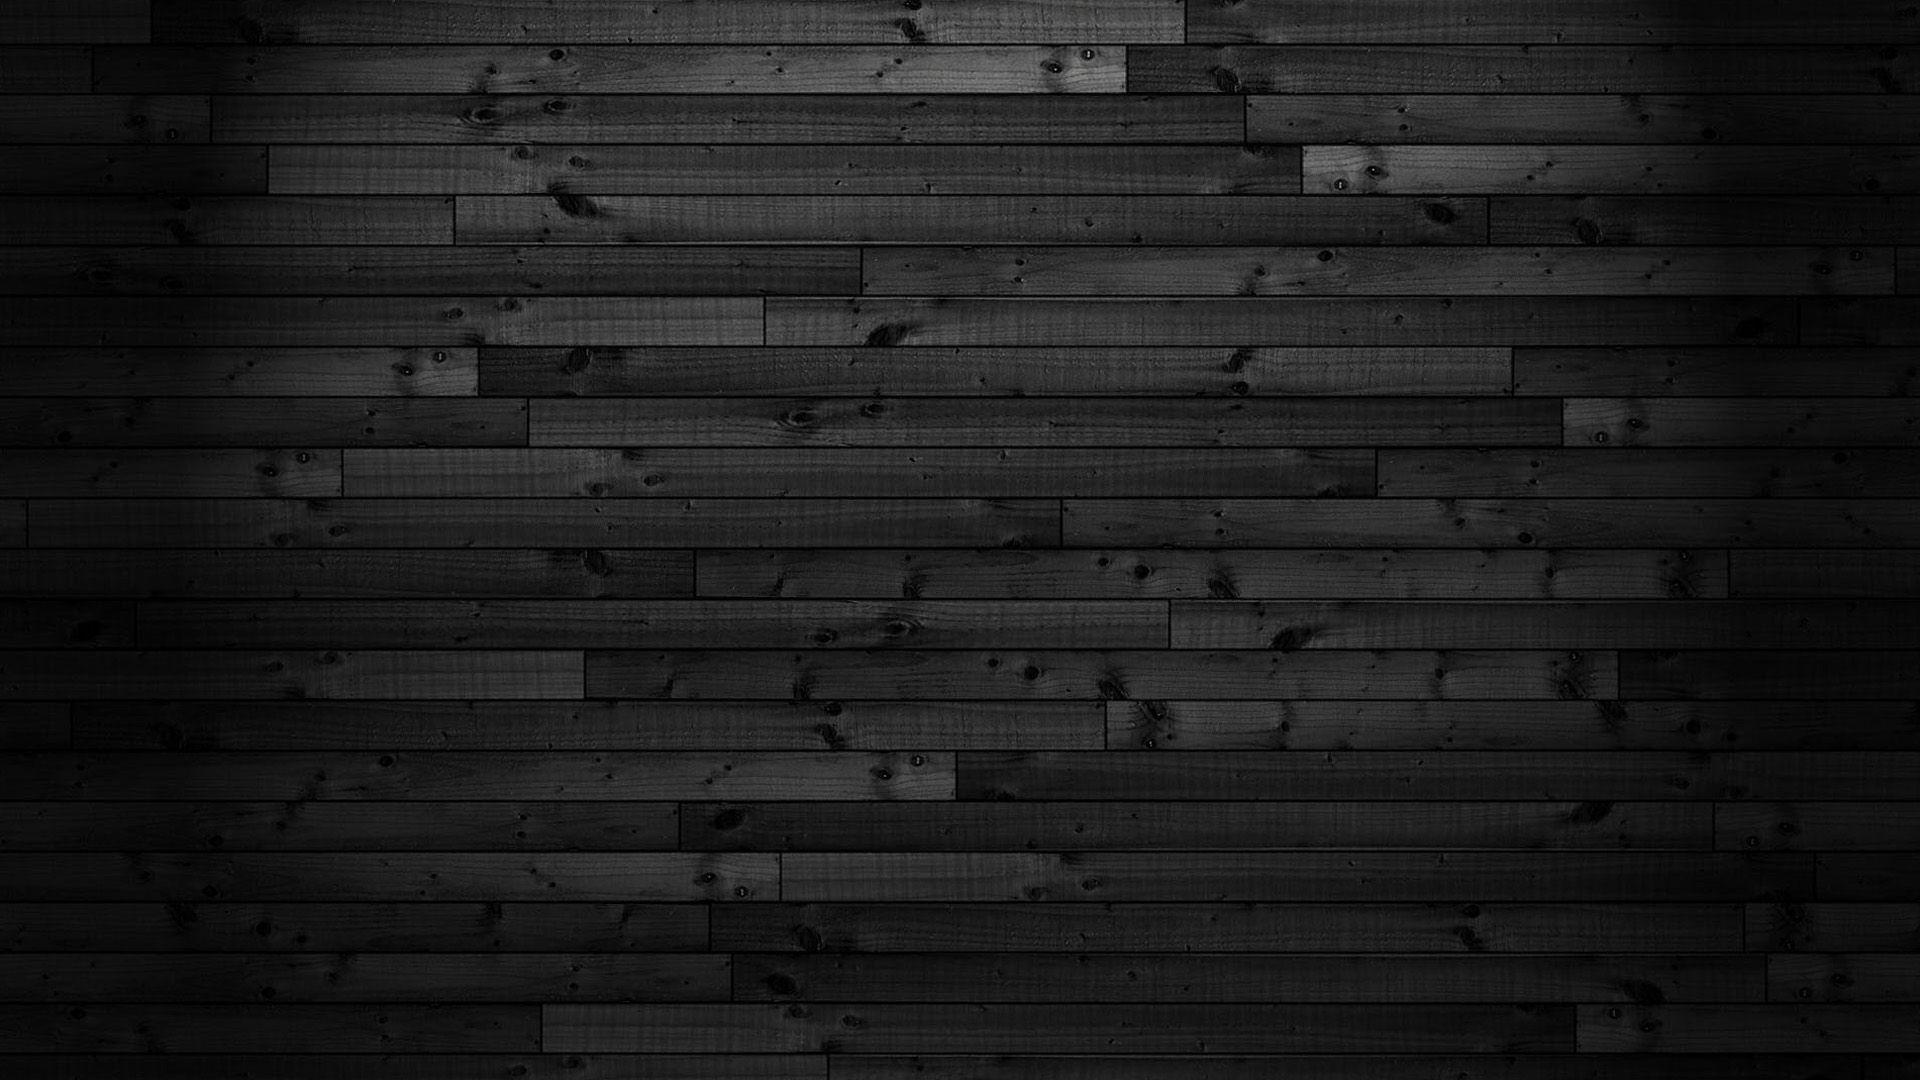 Black Wooden Wall Wallpapers Hd 19x1080 Jpg 19 1080